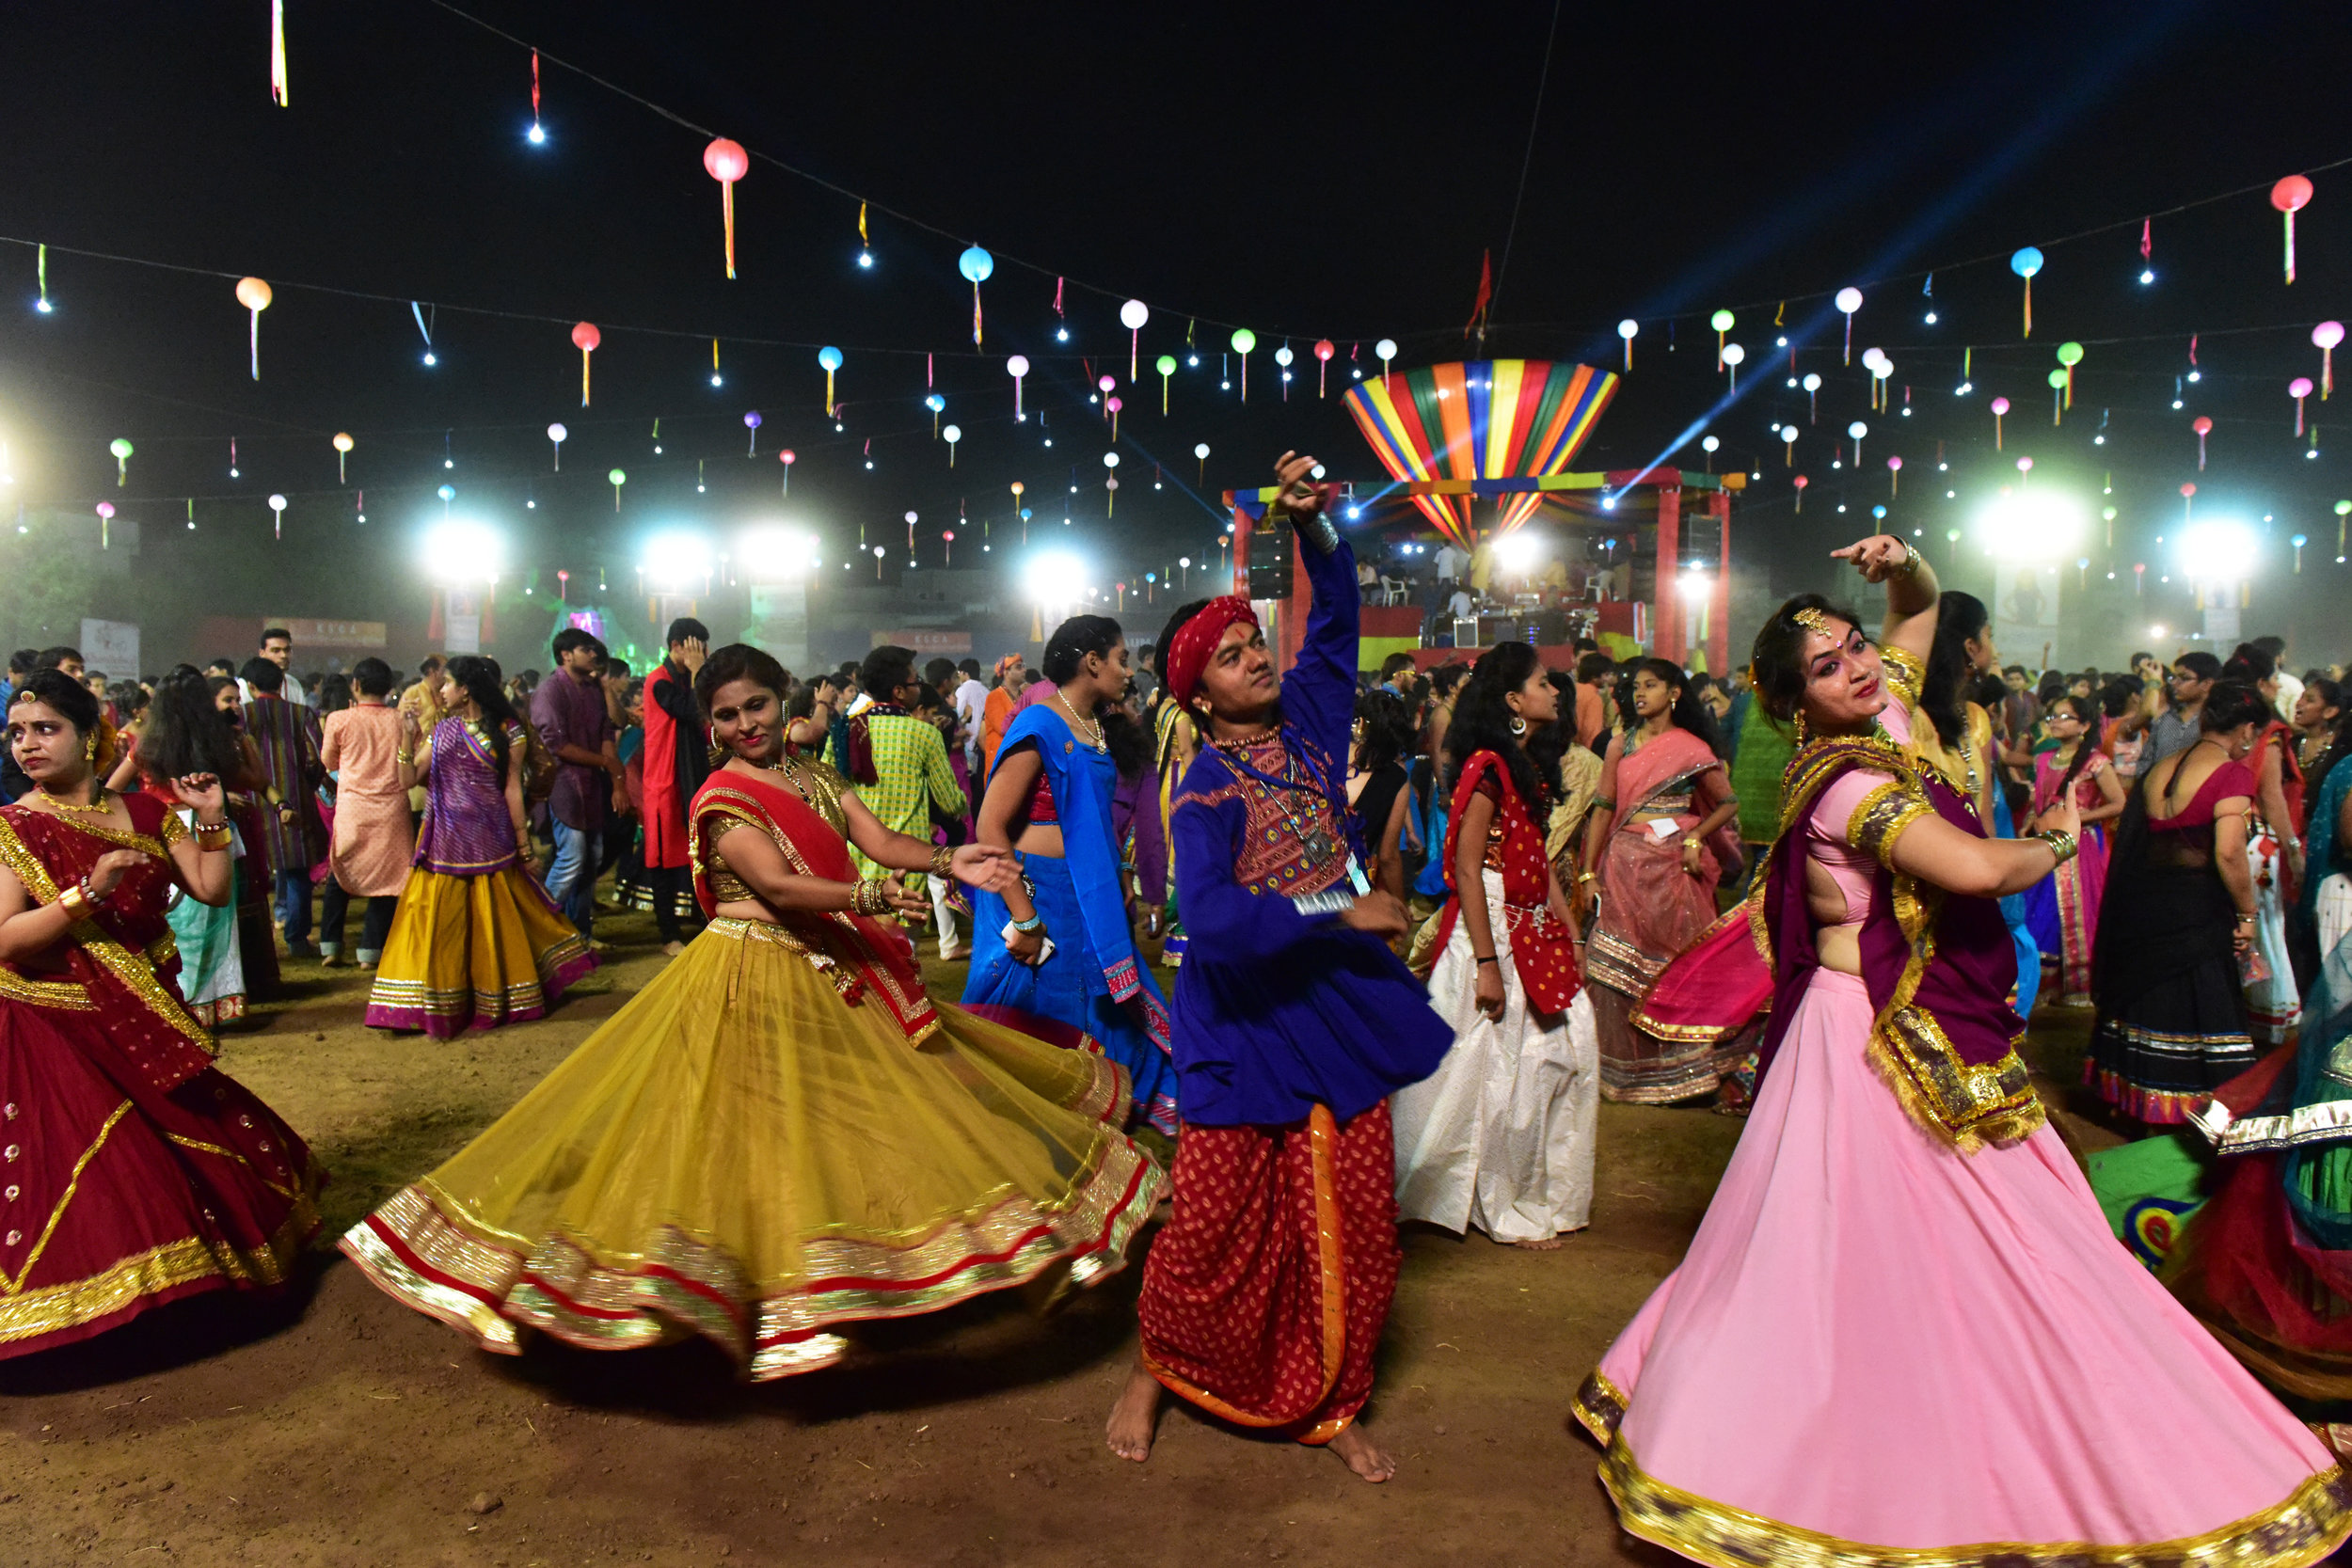 saturday Dancers performing the Garba Photo Credit Manish Vyas.JPG